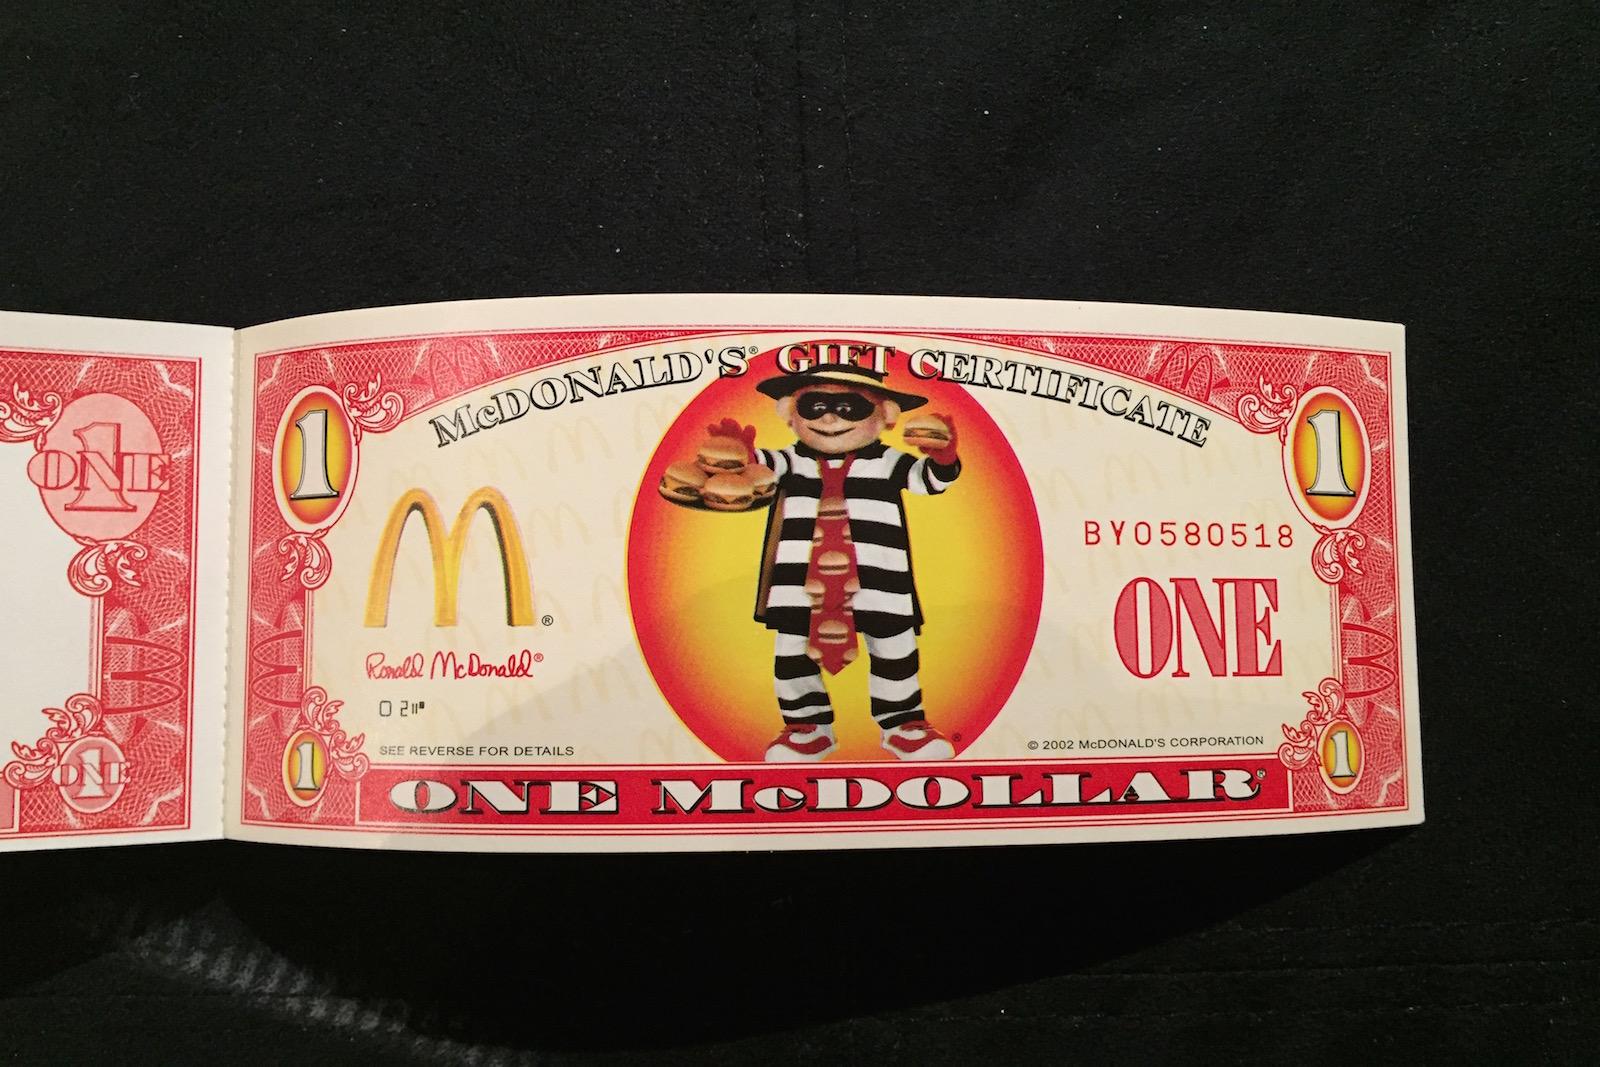 mcdonald coupon mcdonalds thousands worth think cathy kates